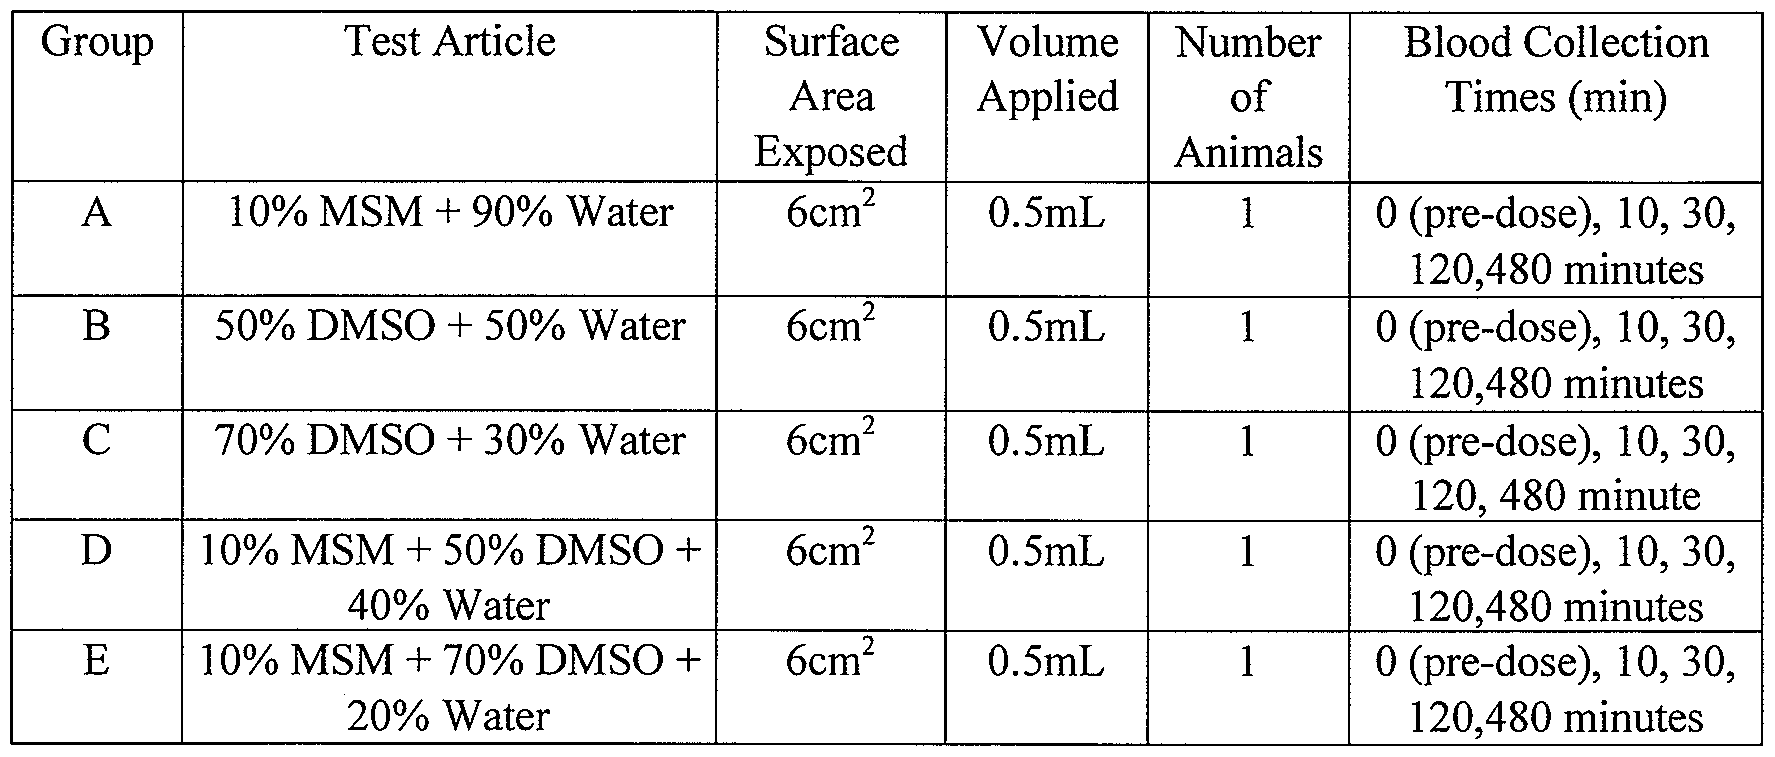 WO2011053874A1 - Dimethyl sulfoxide (dmso) and